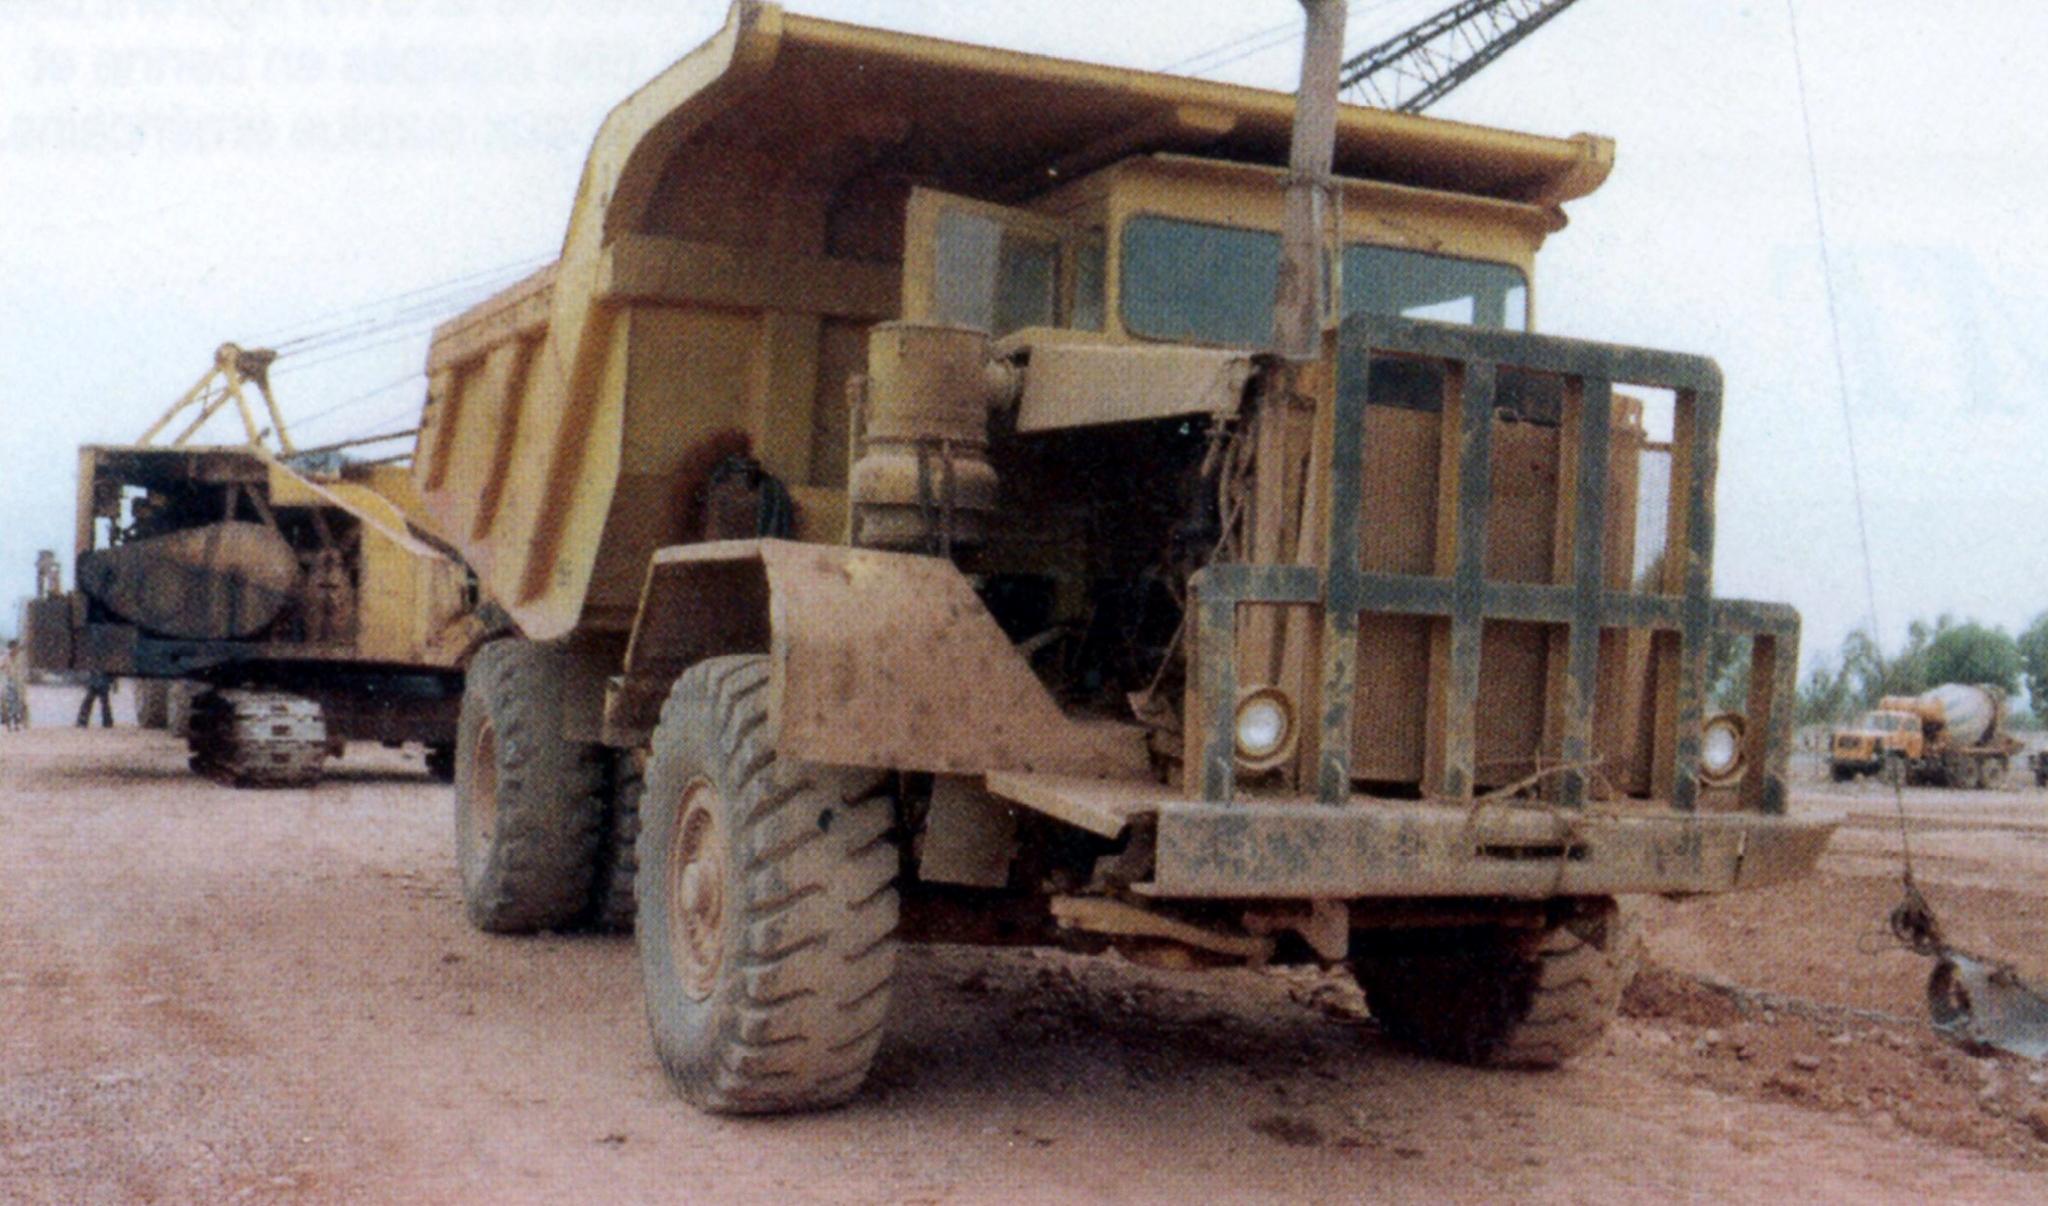 Transport Routier au Maroc - Histoire - Page 2 49876562497_b247f5c8f8_o_d